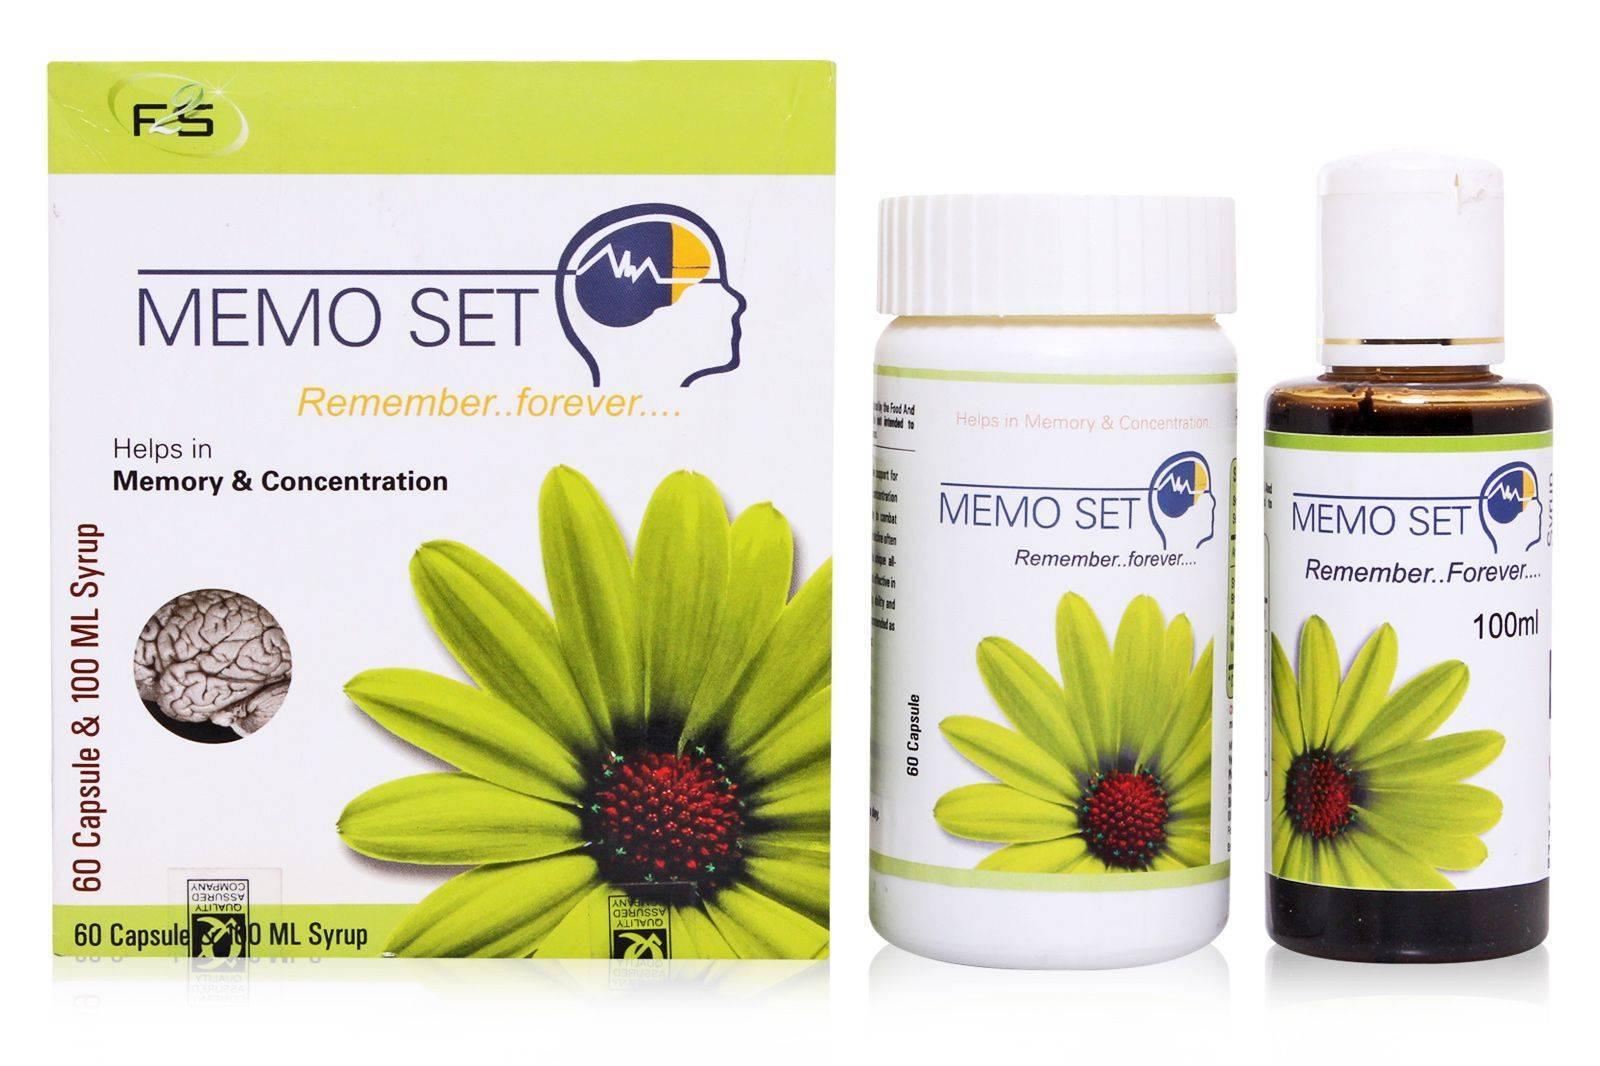 Memoset memory enhancer healthcare Supplement